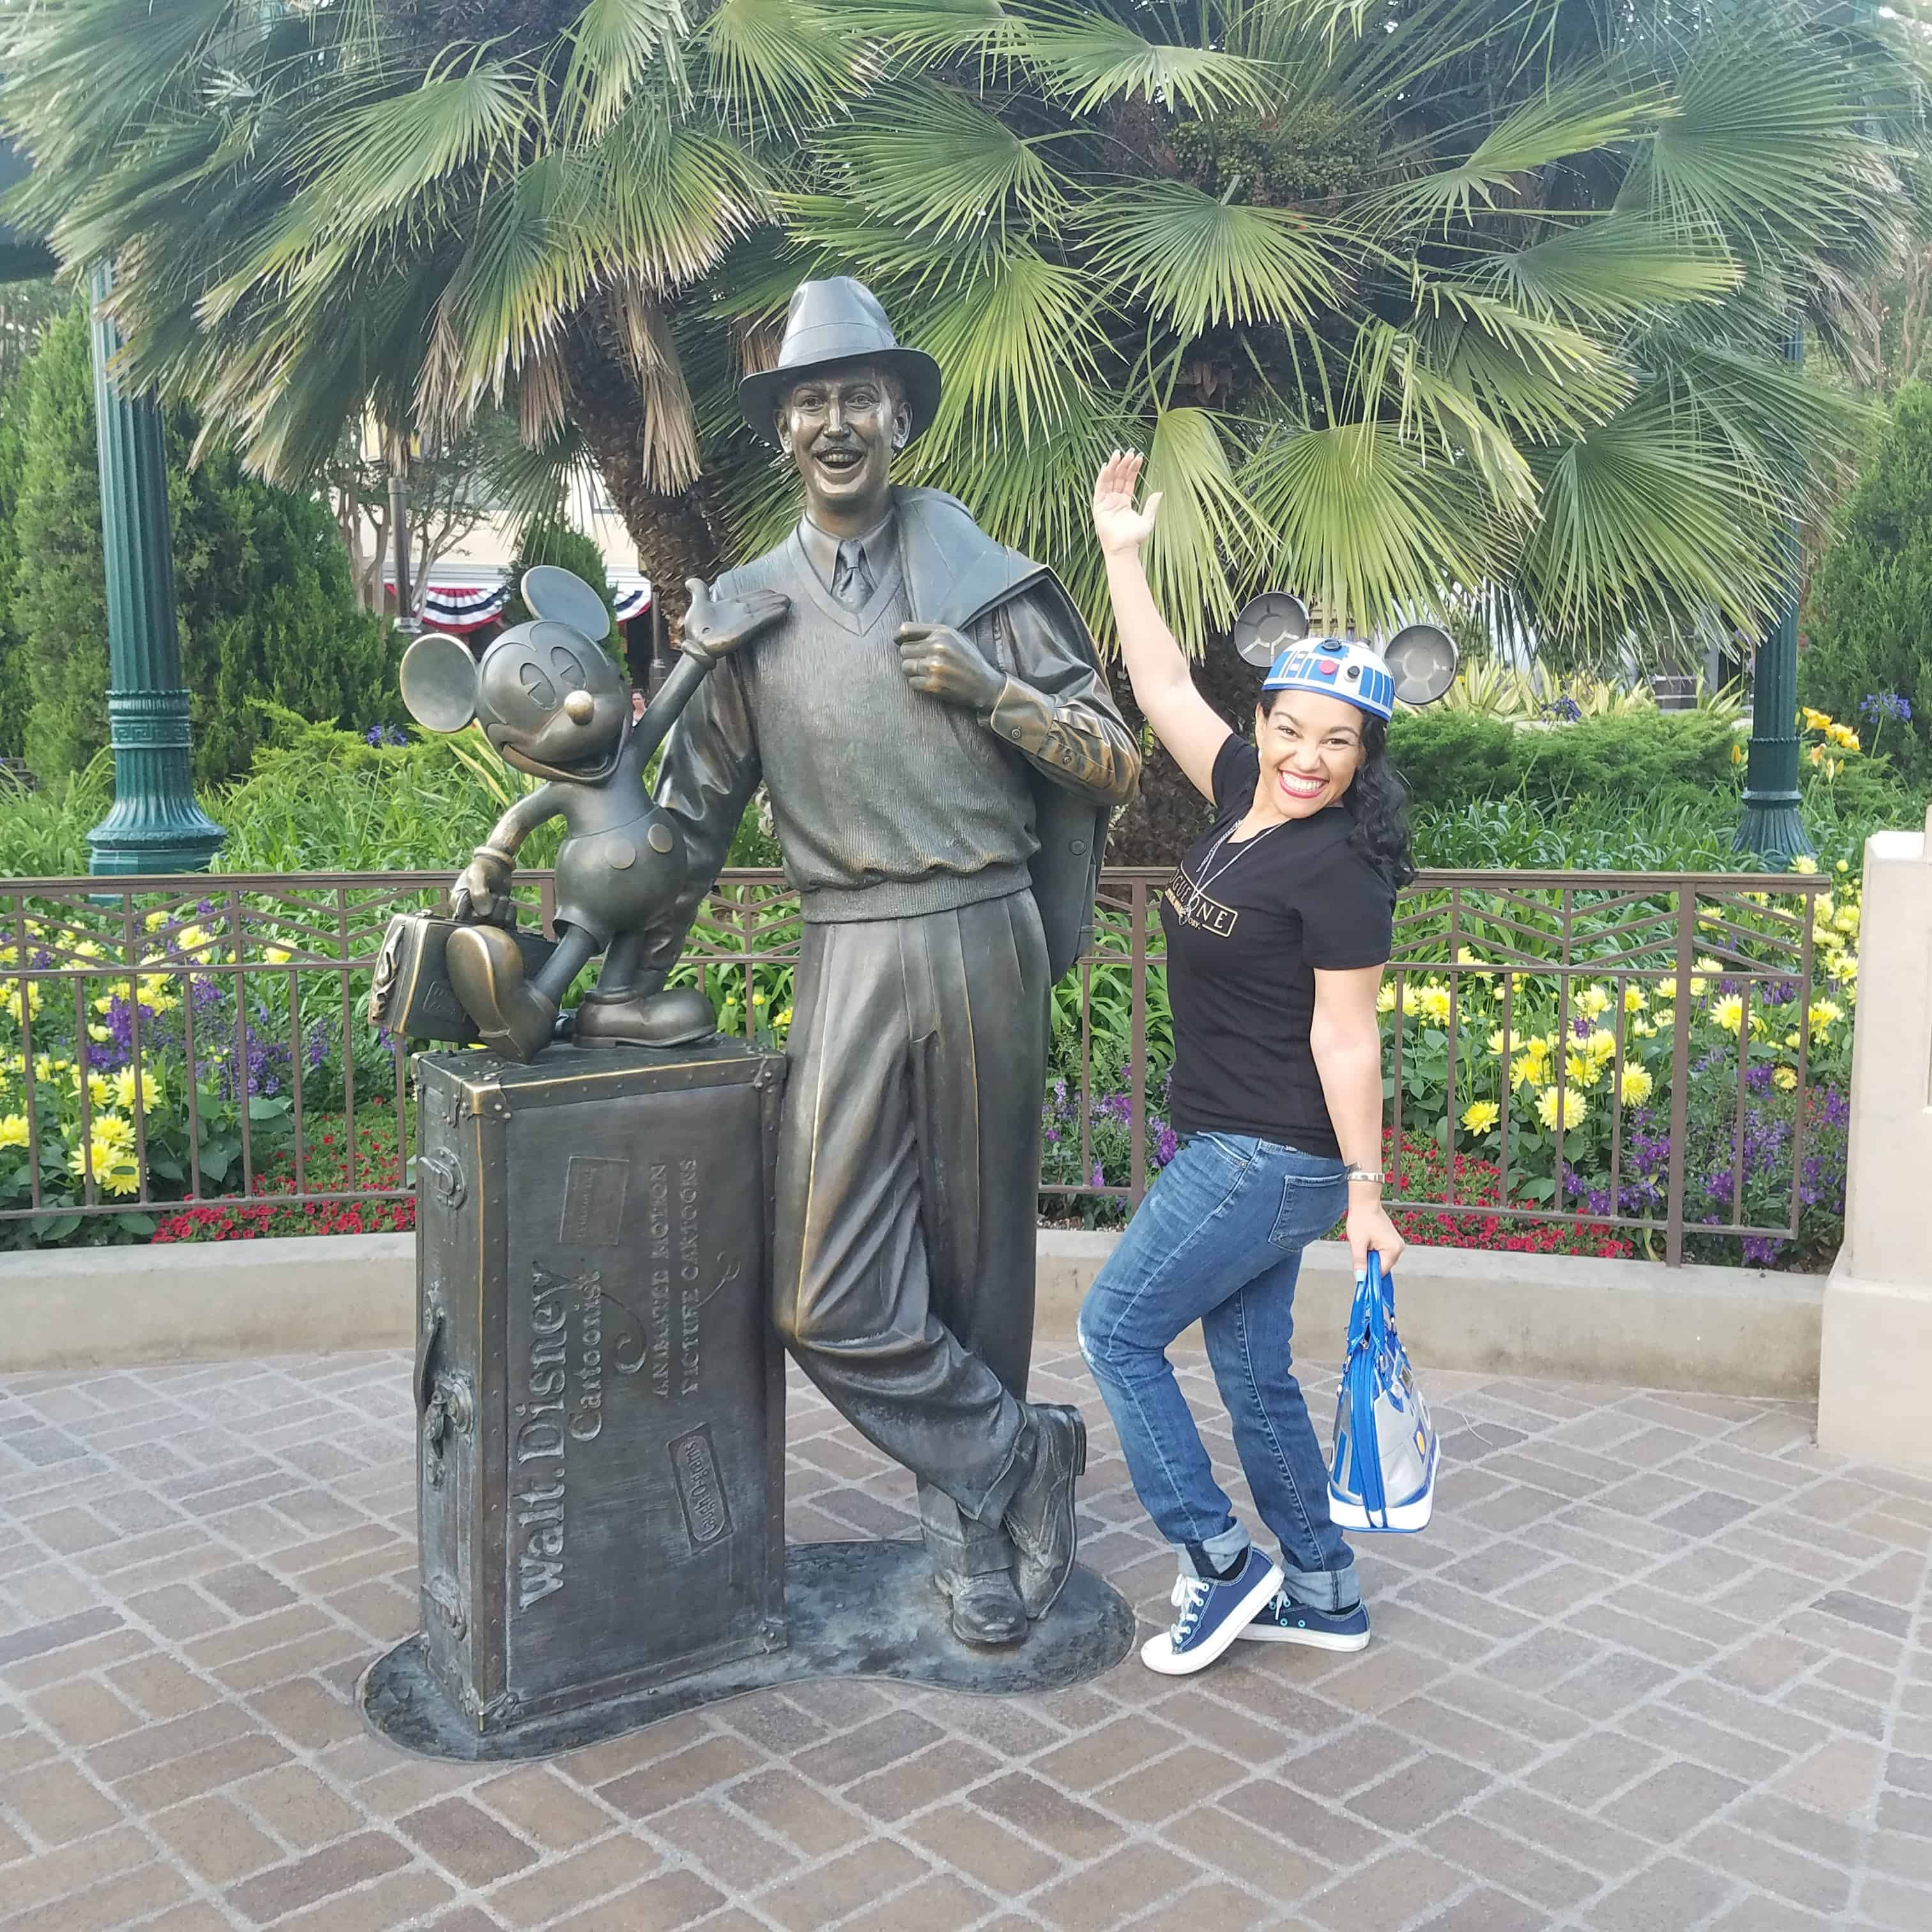 While at D23 Expo - Disneyland and Disney California Adventure - Walt Disney and Elayna Fernandez